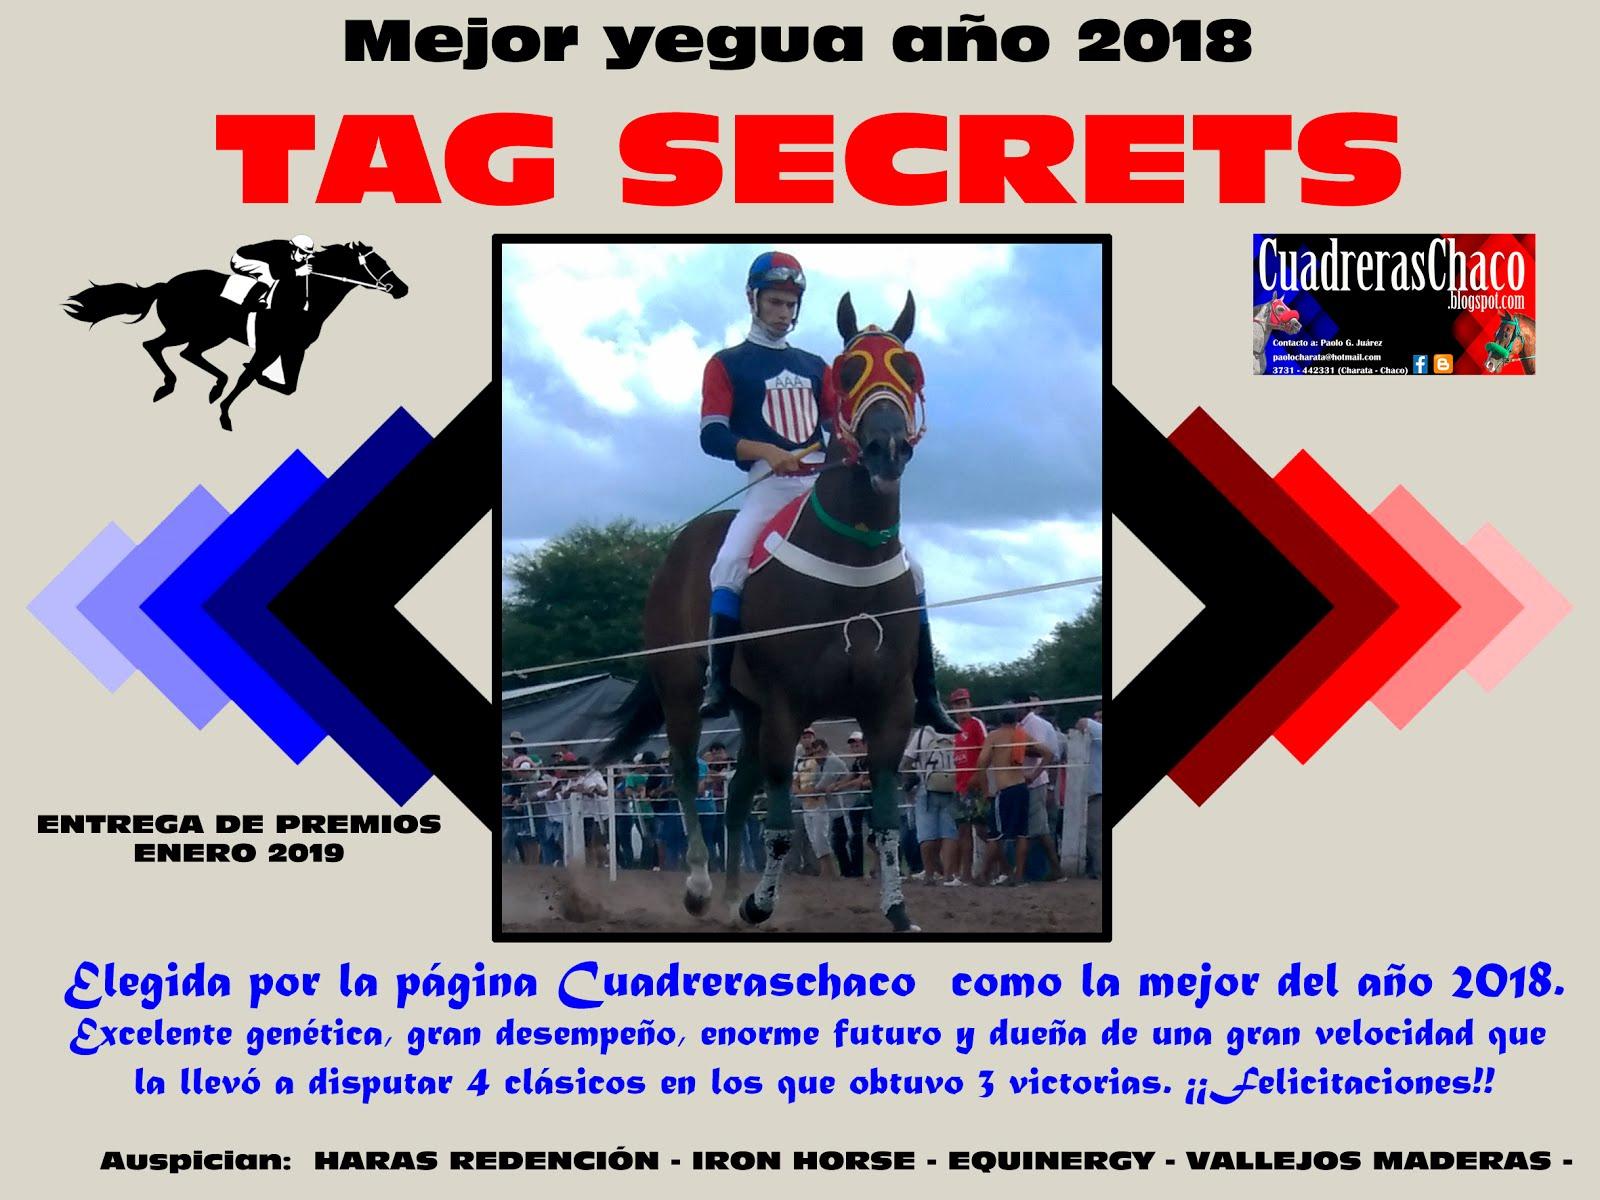 tag secrets 2018